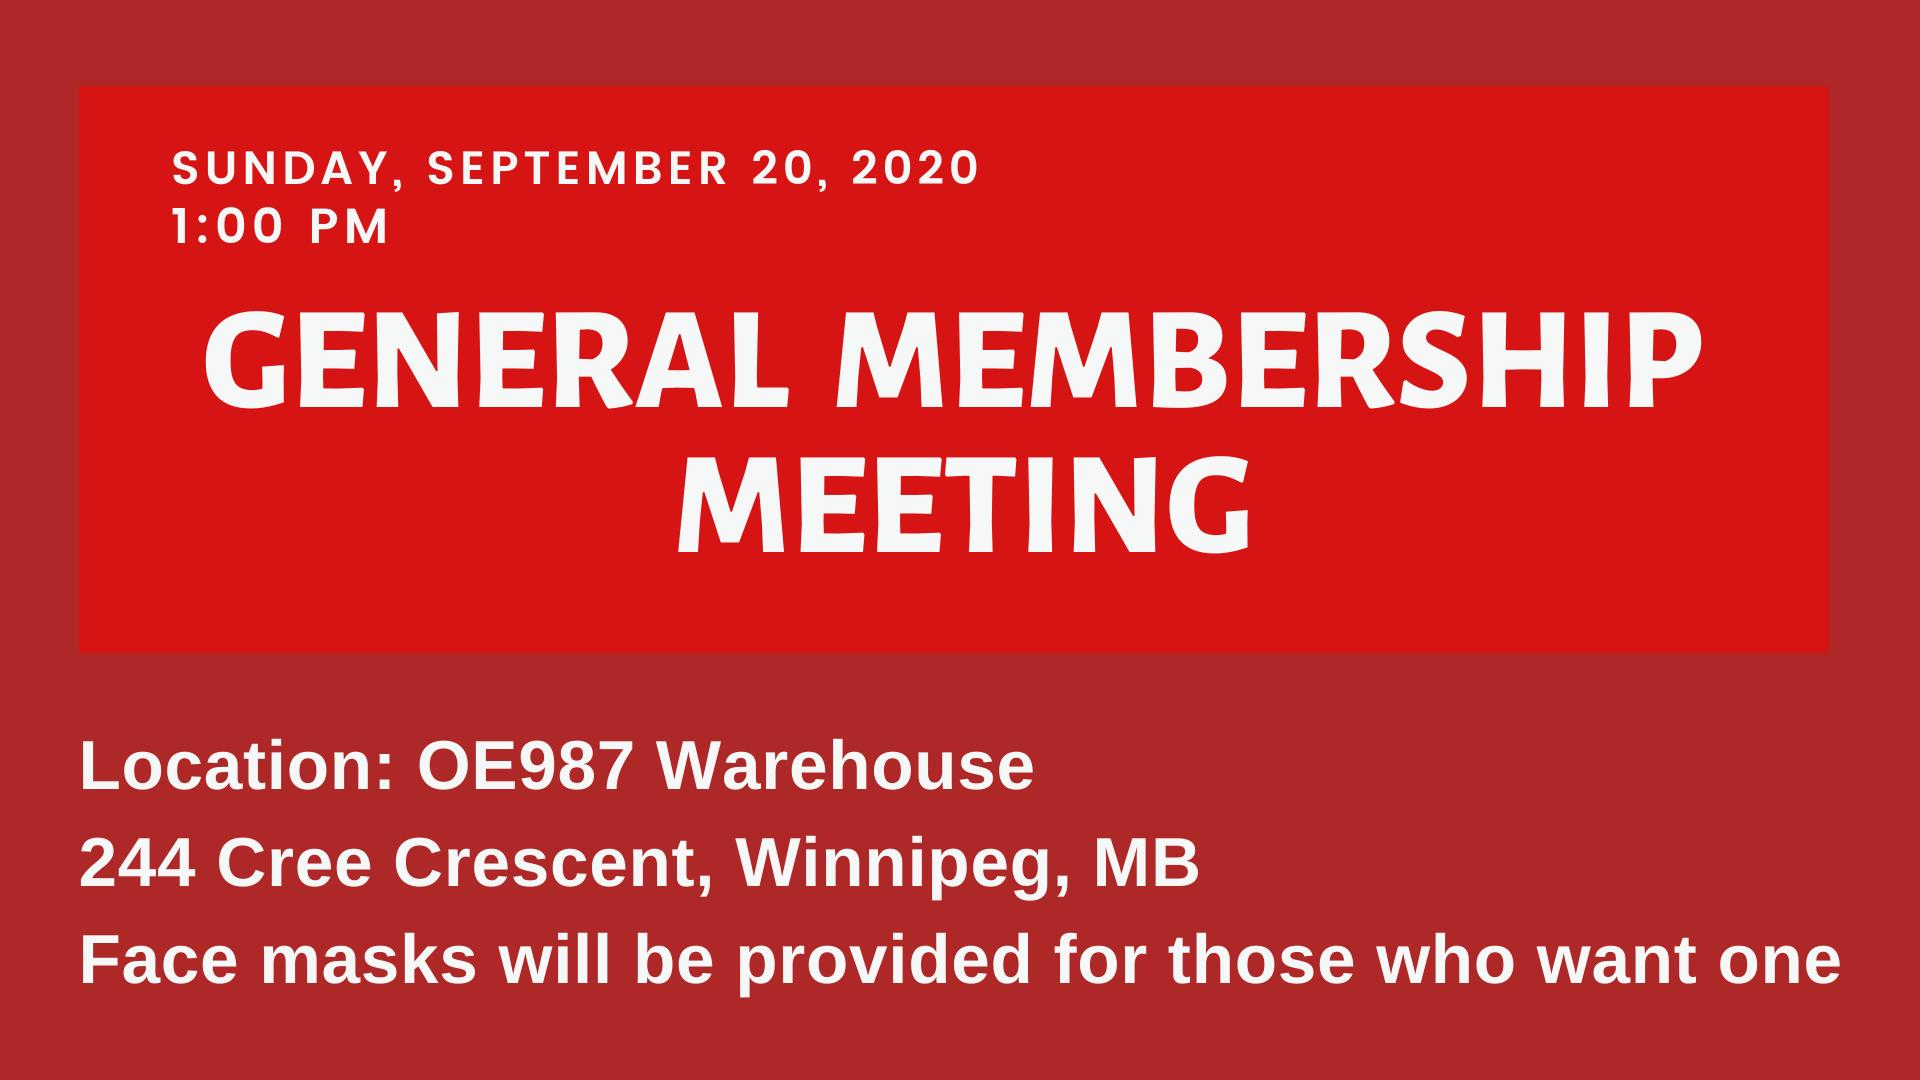 Image for General Membership Meeting – Sunday, September 20, 2020